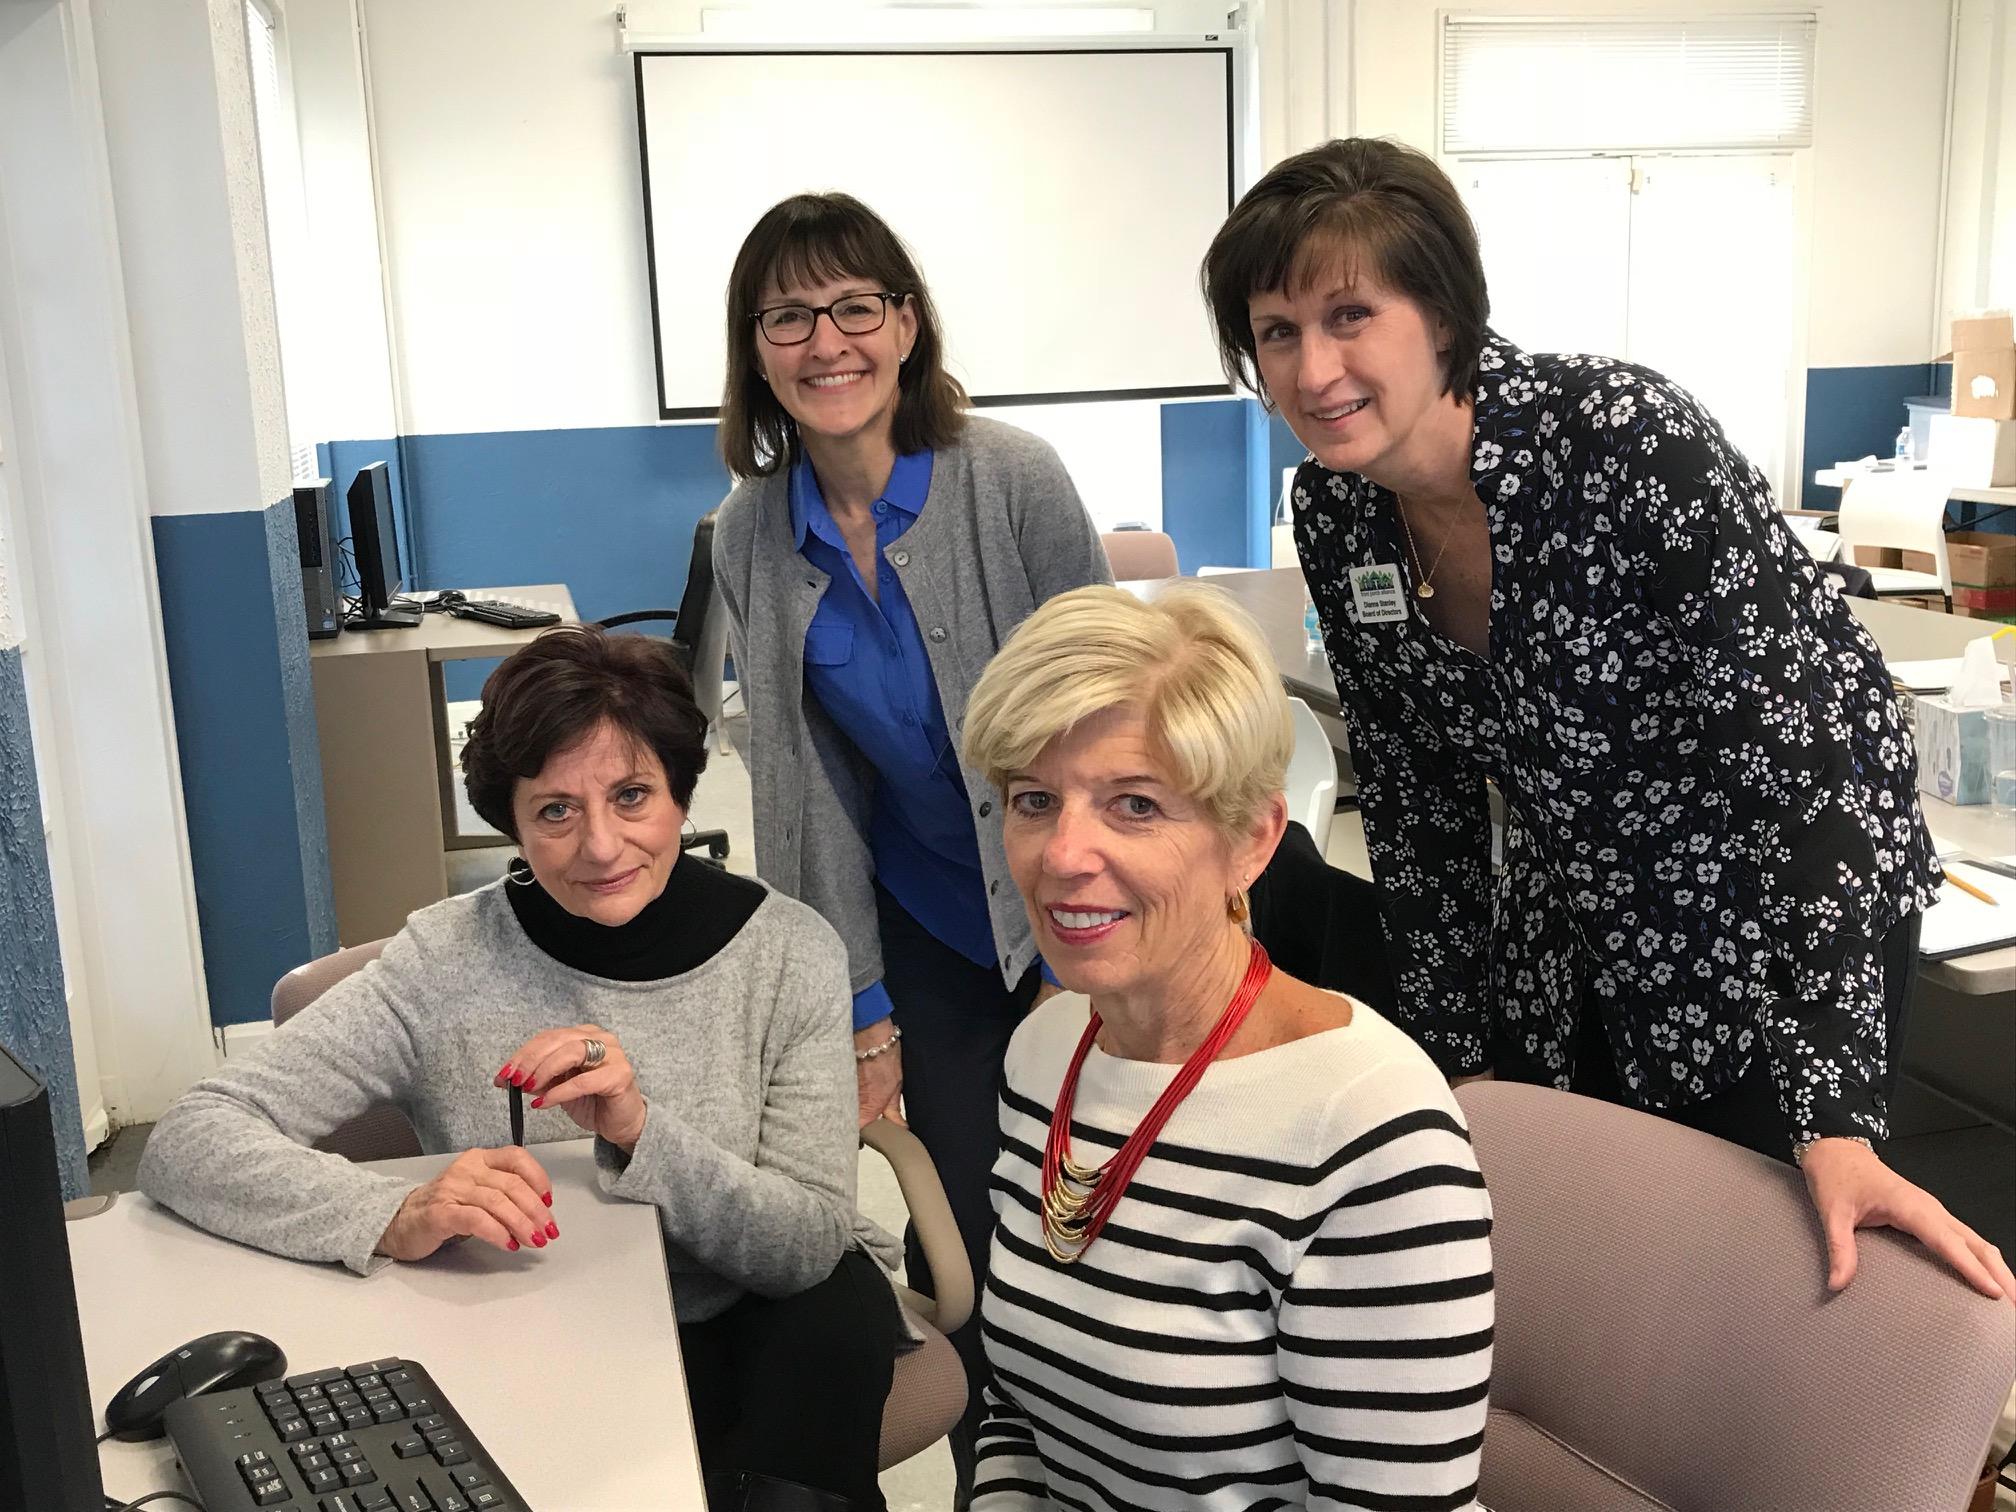 Pauline Moley, Secretary Julie Sykes, Sally Stanton, Dianne Stanley